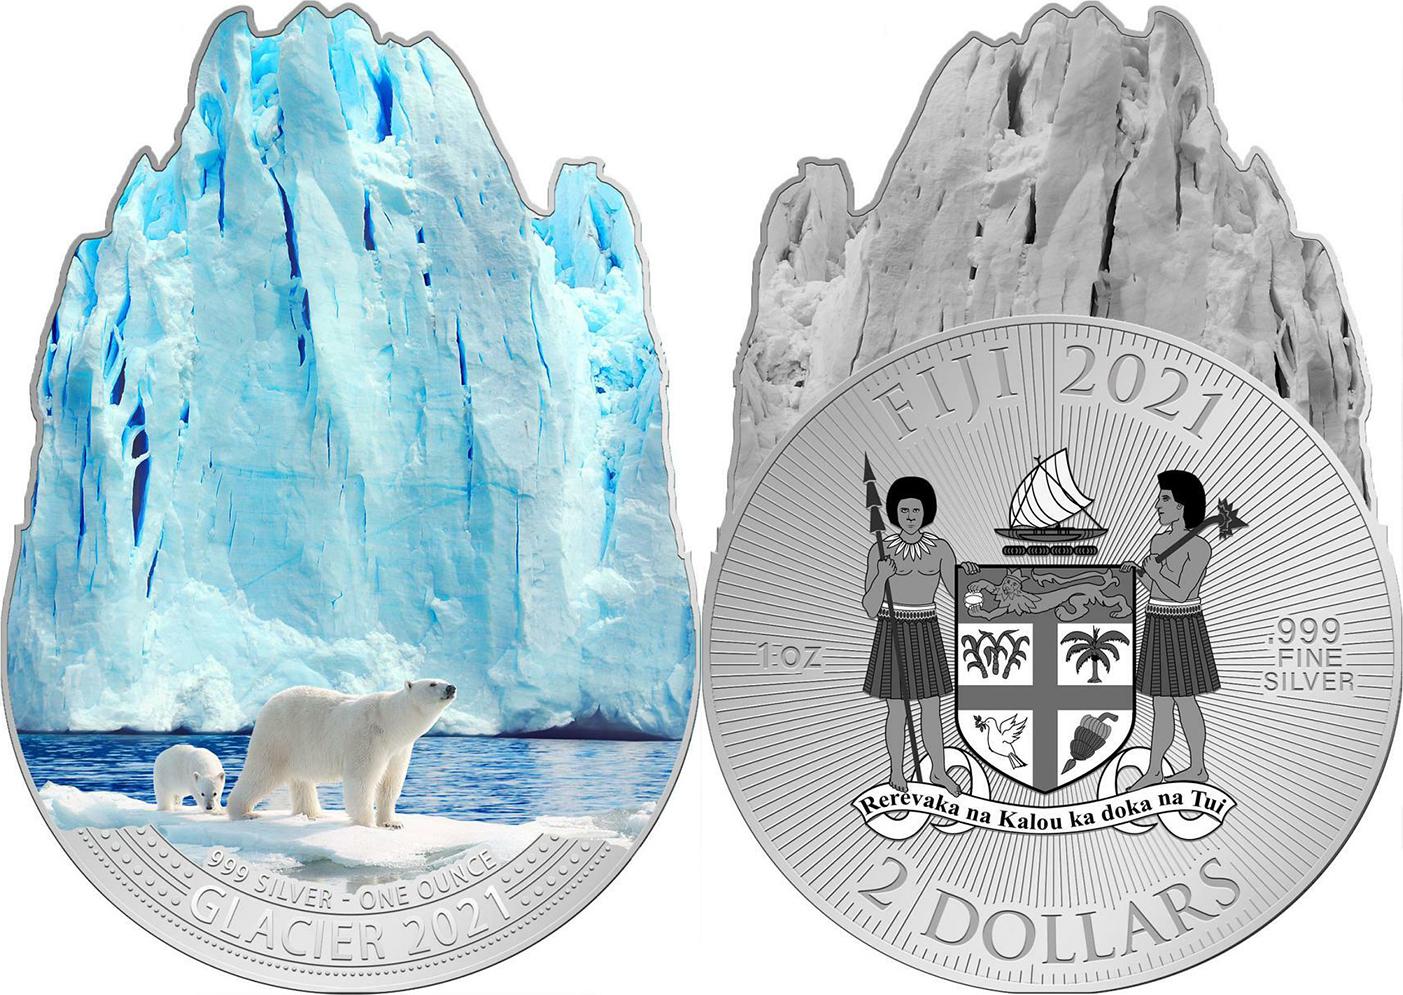 fidji-2021-glacier-ours-polaire